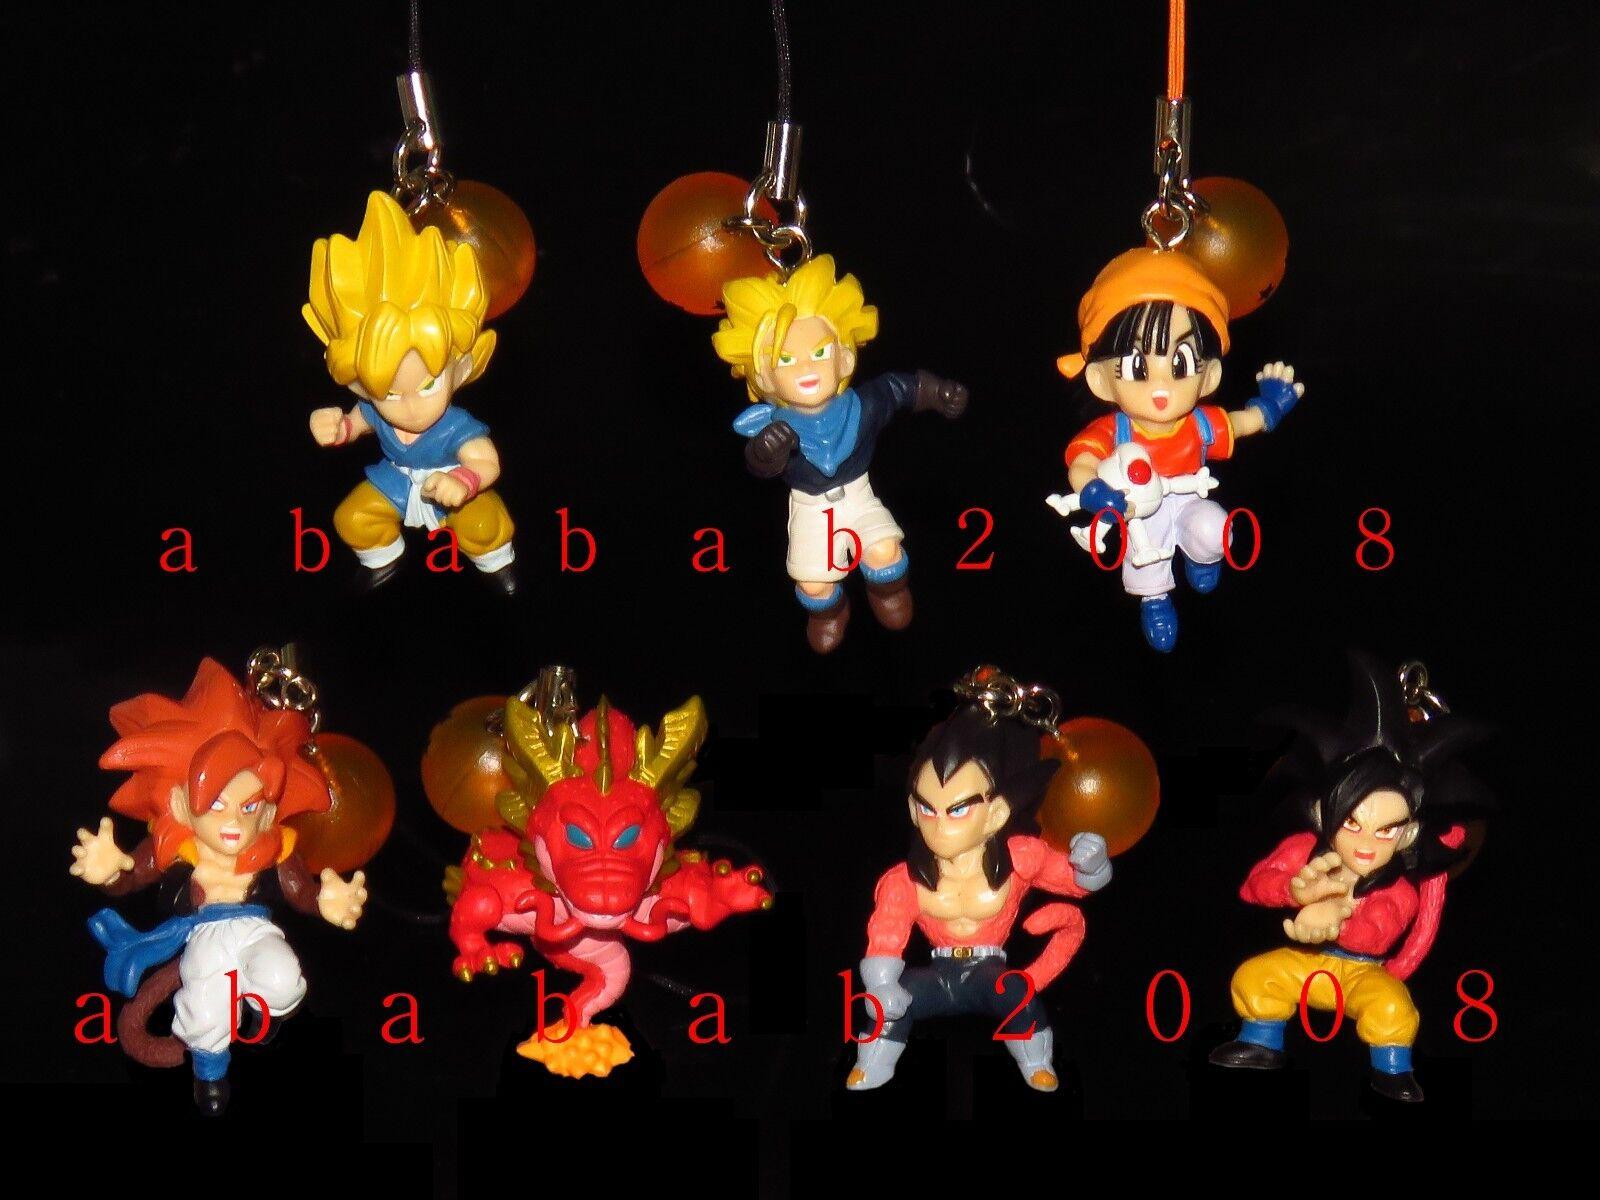 Bandai Dragonball Z DB Part.2 strap Gashapon figure (full (full (full set of 7 figures) 9249f1